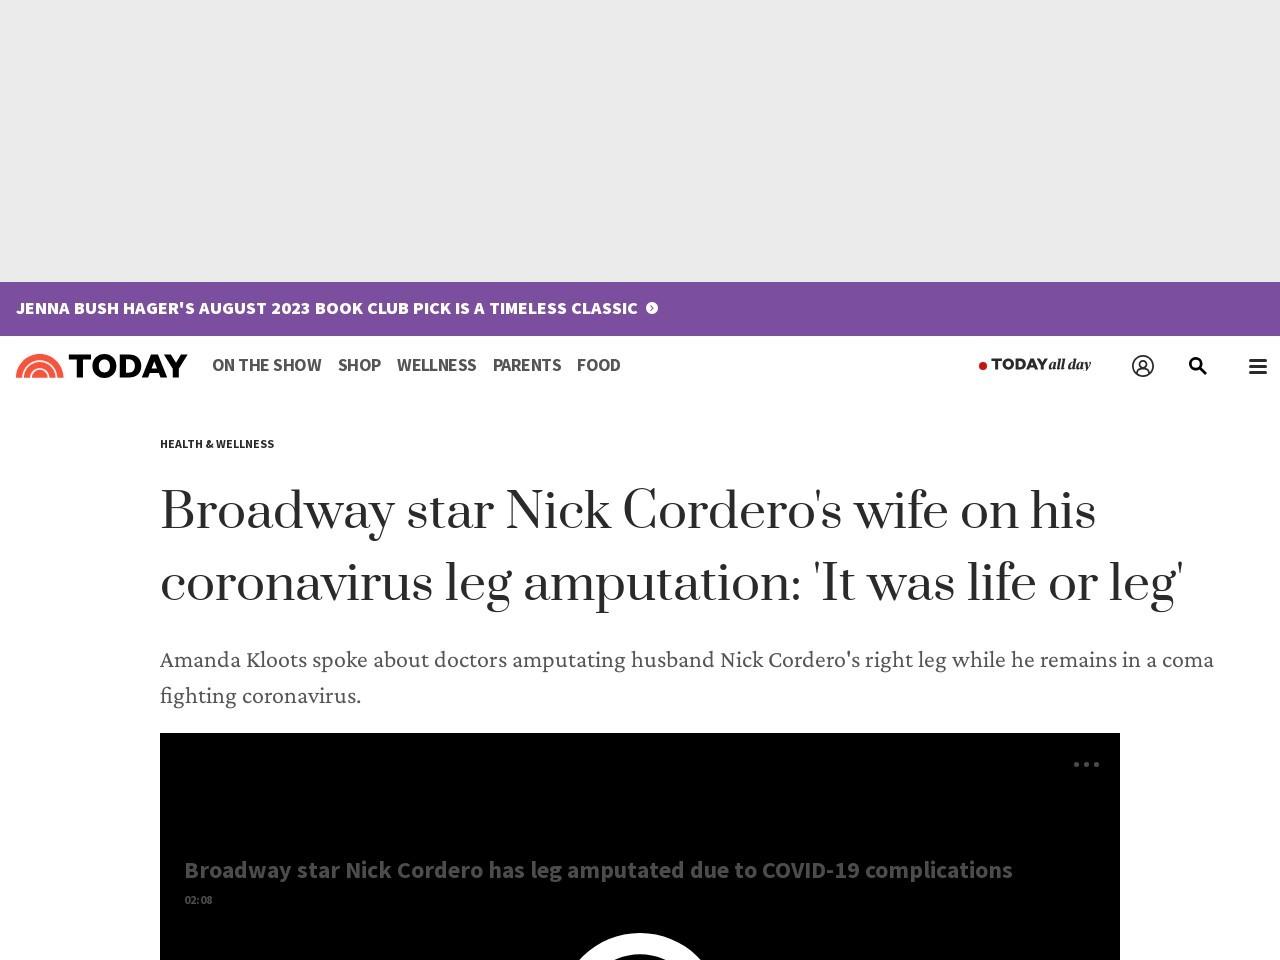 Nick Cordero's wife on his coronavirus leg amputation: 'It was life or leg'